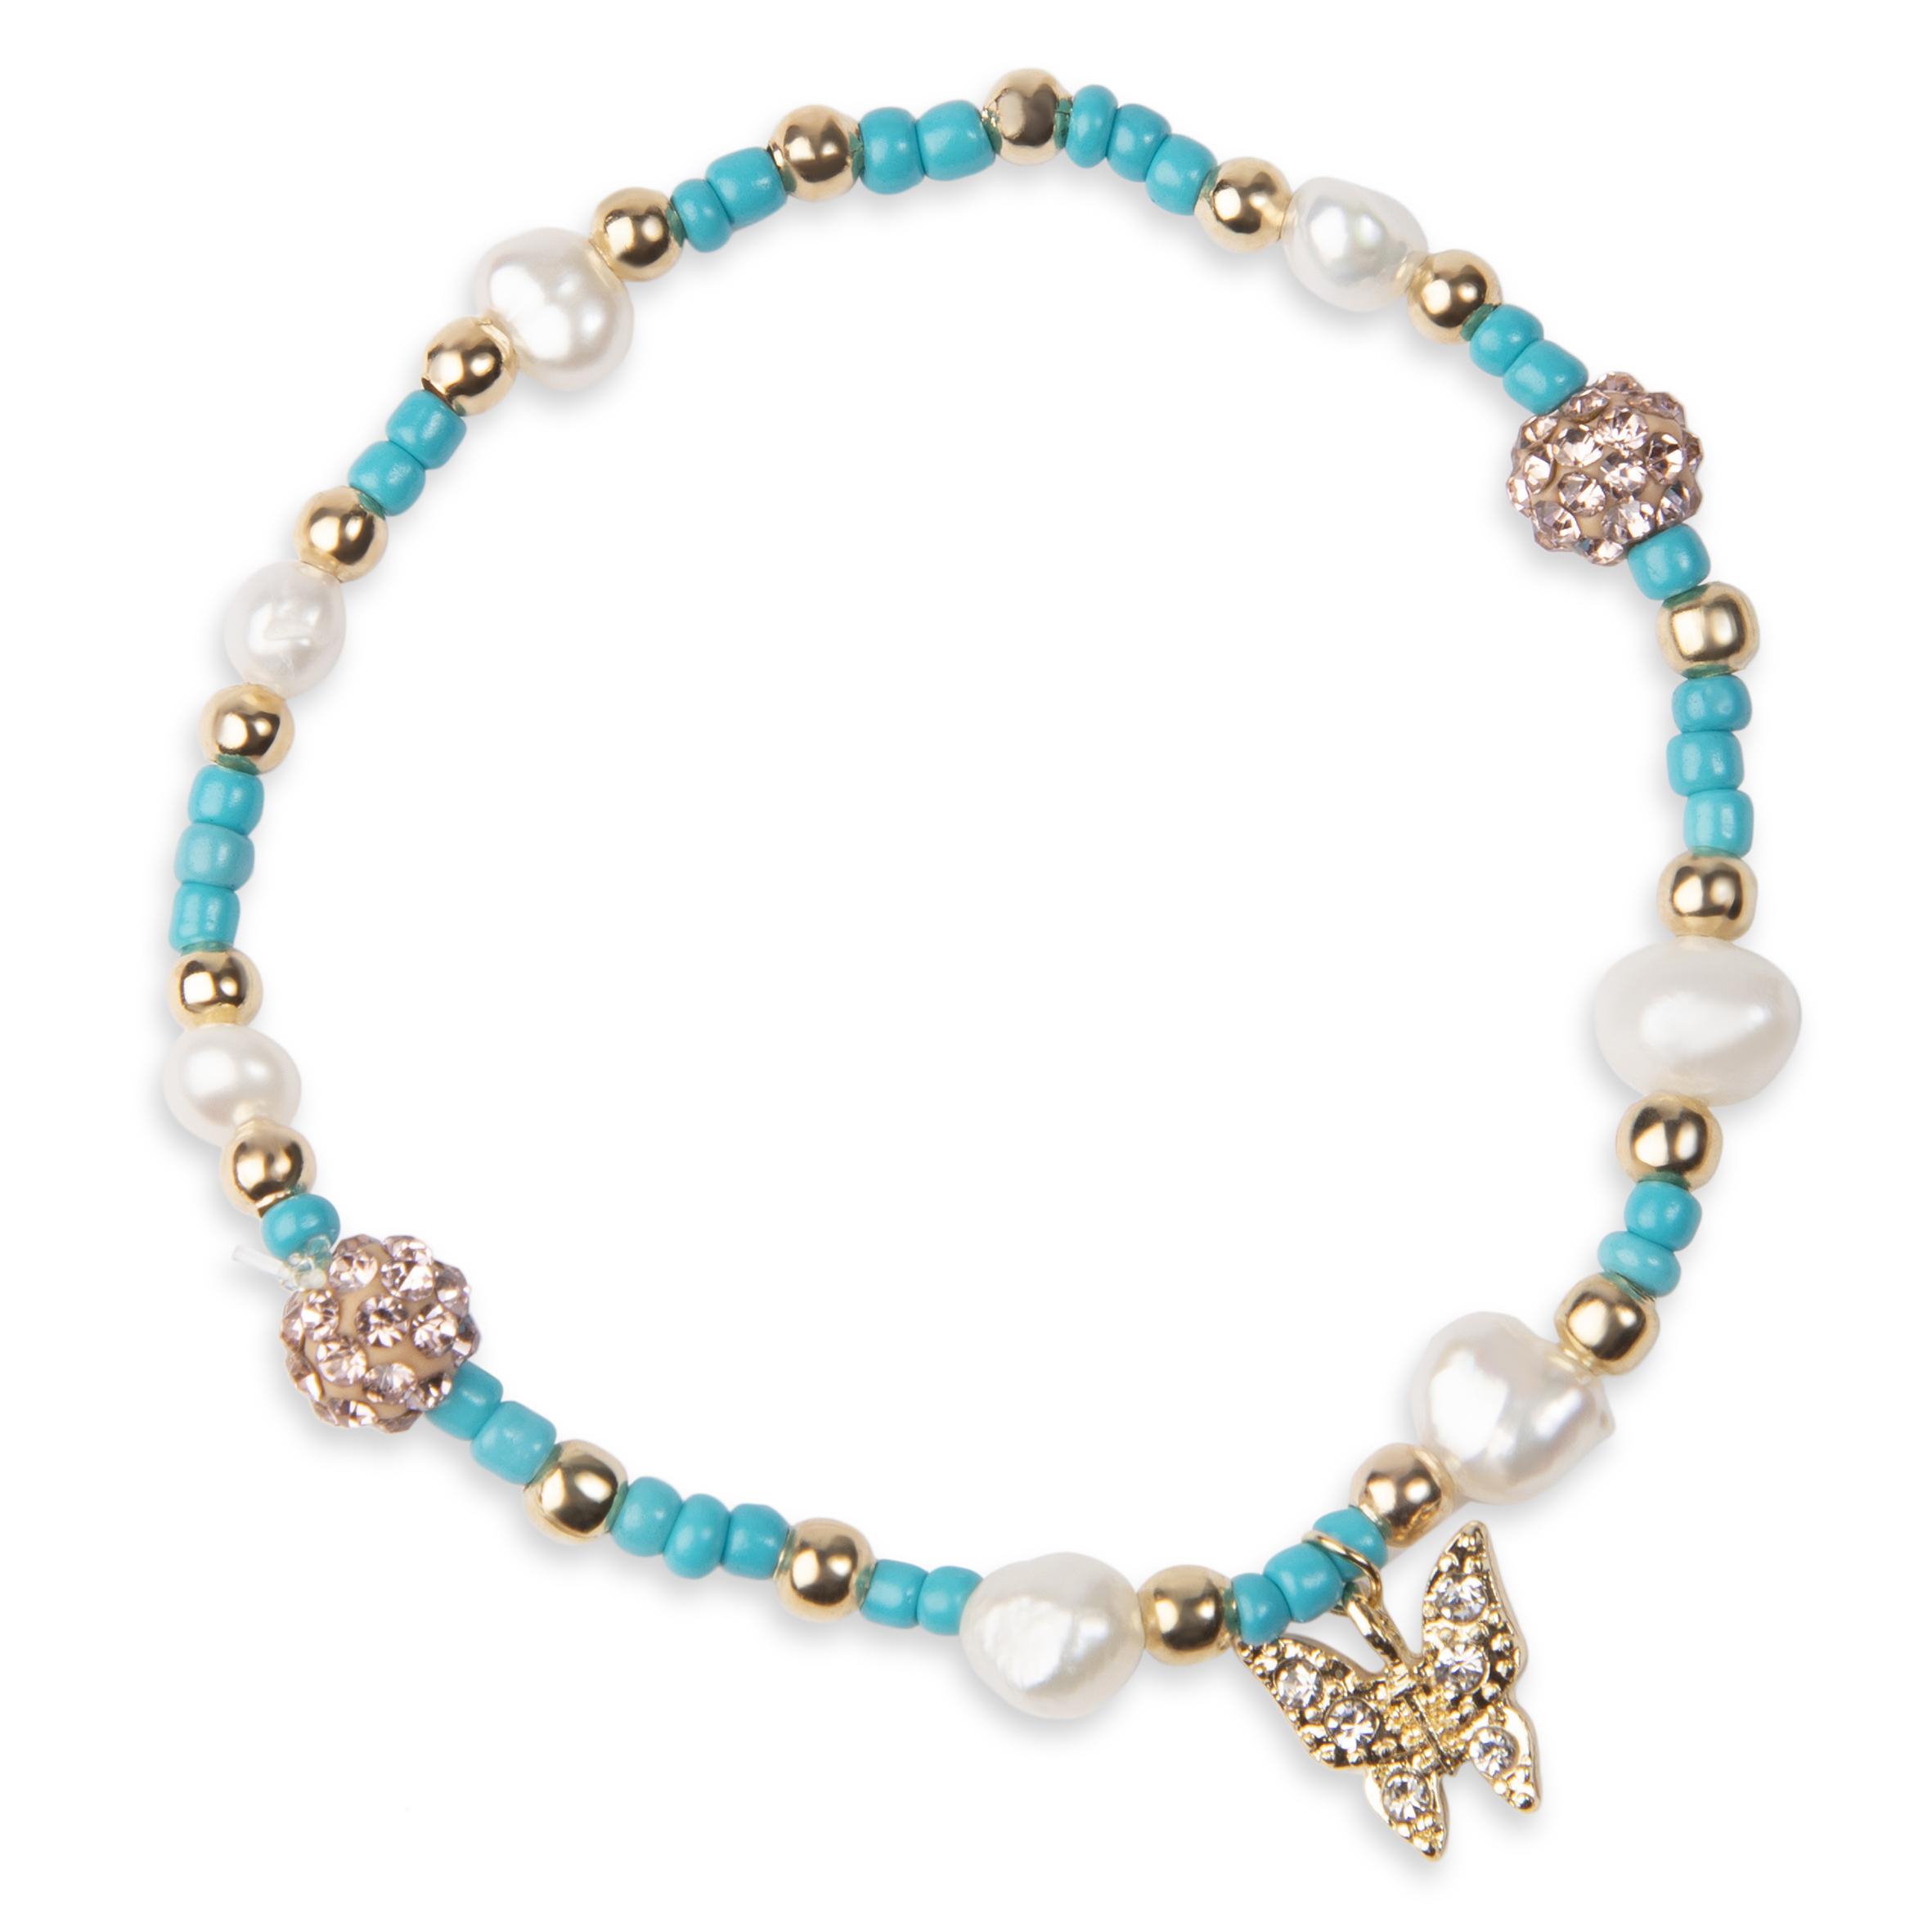 Barnsmycke pfg Stockholm Pearls Kids-Angie Bracelet 11003-05